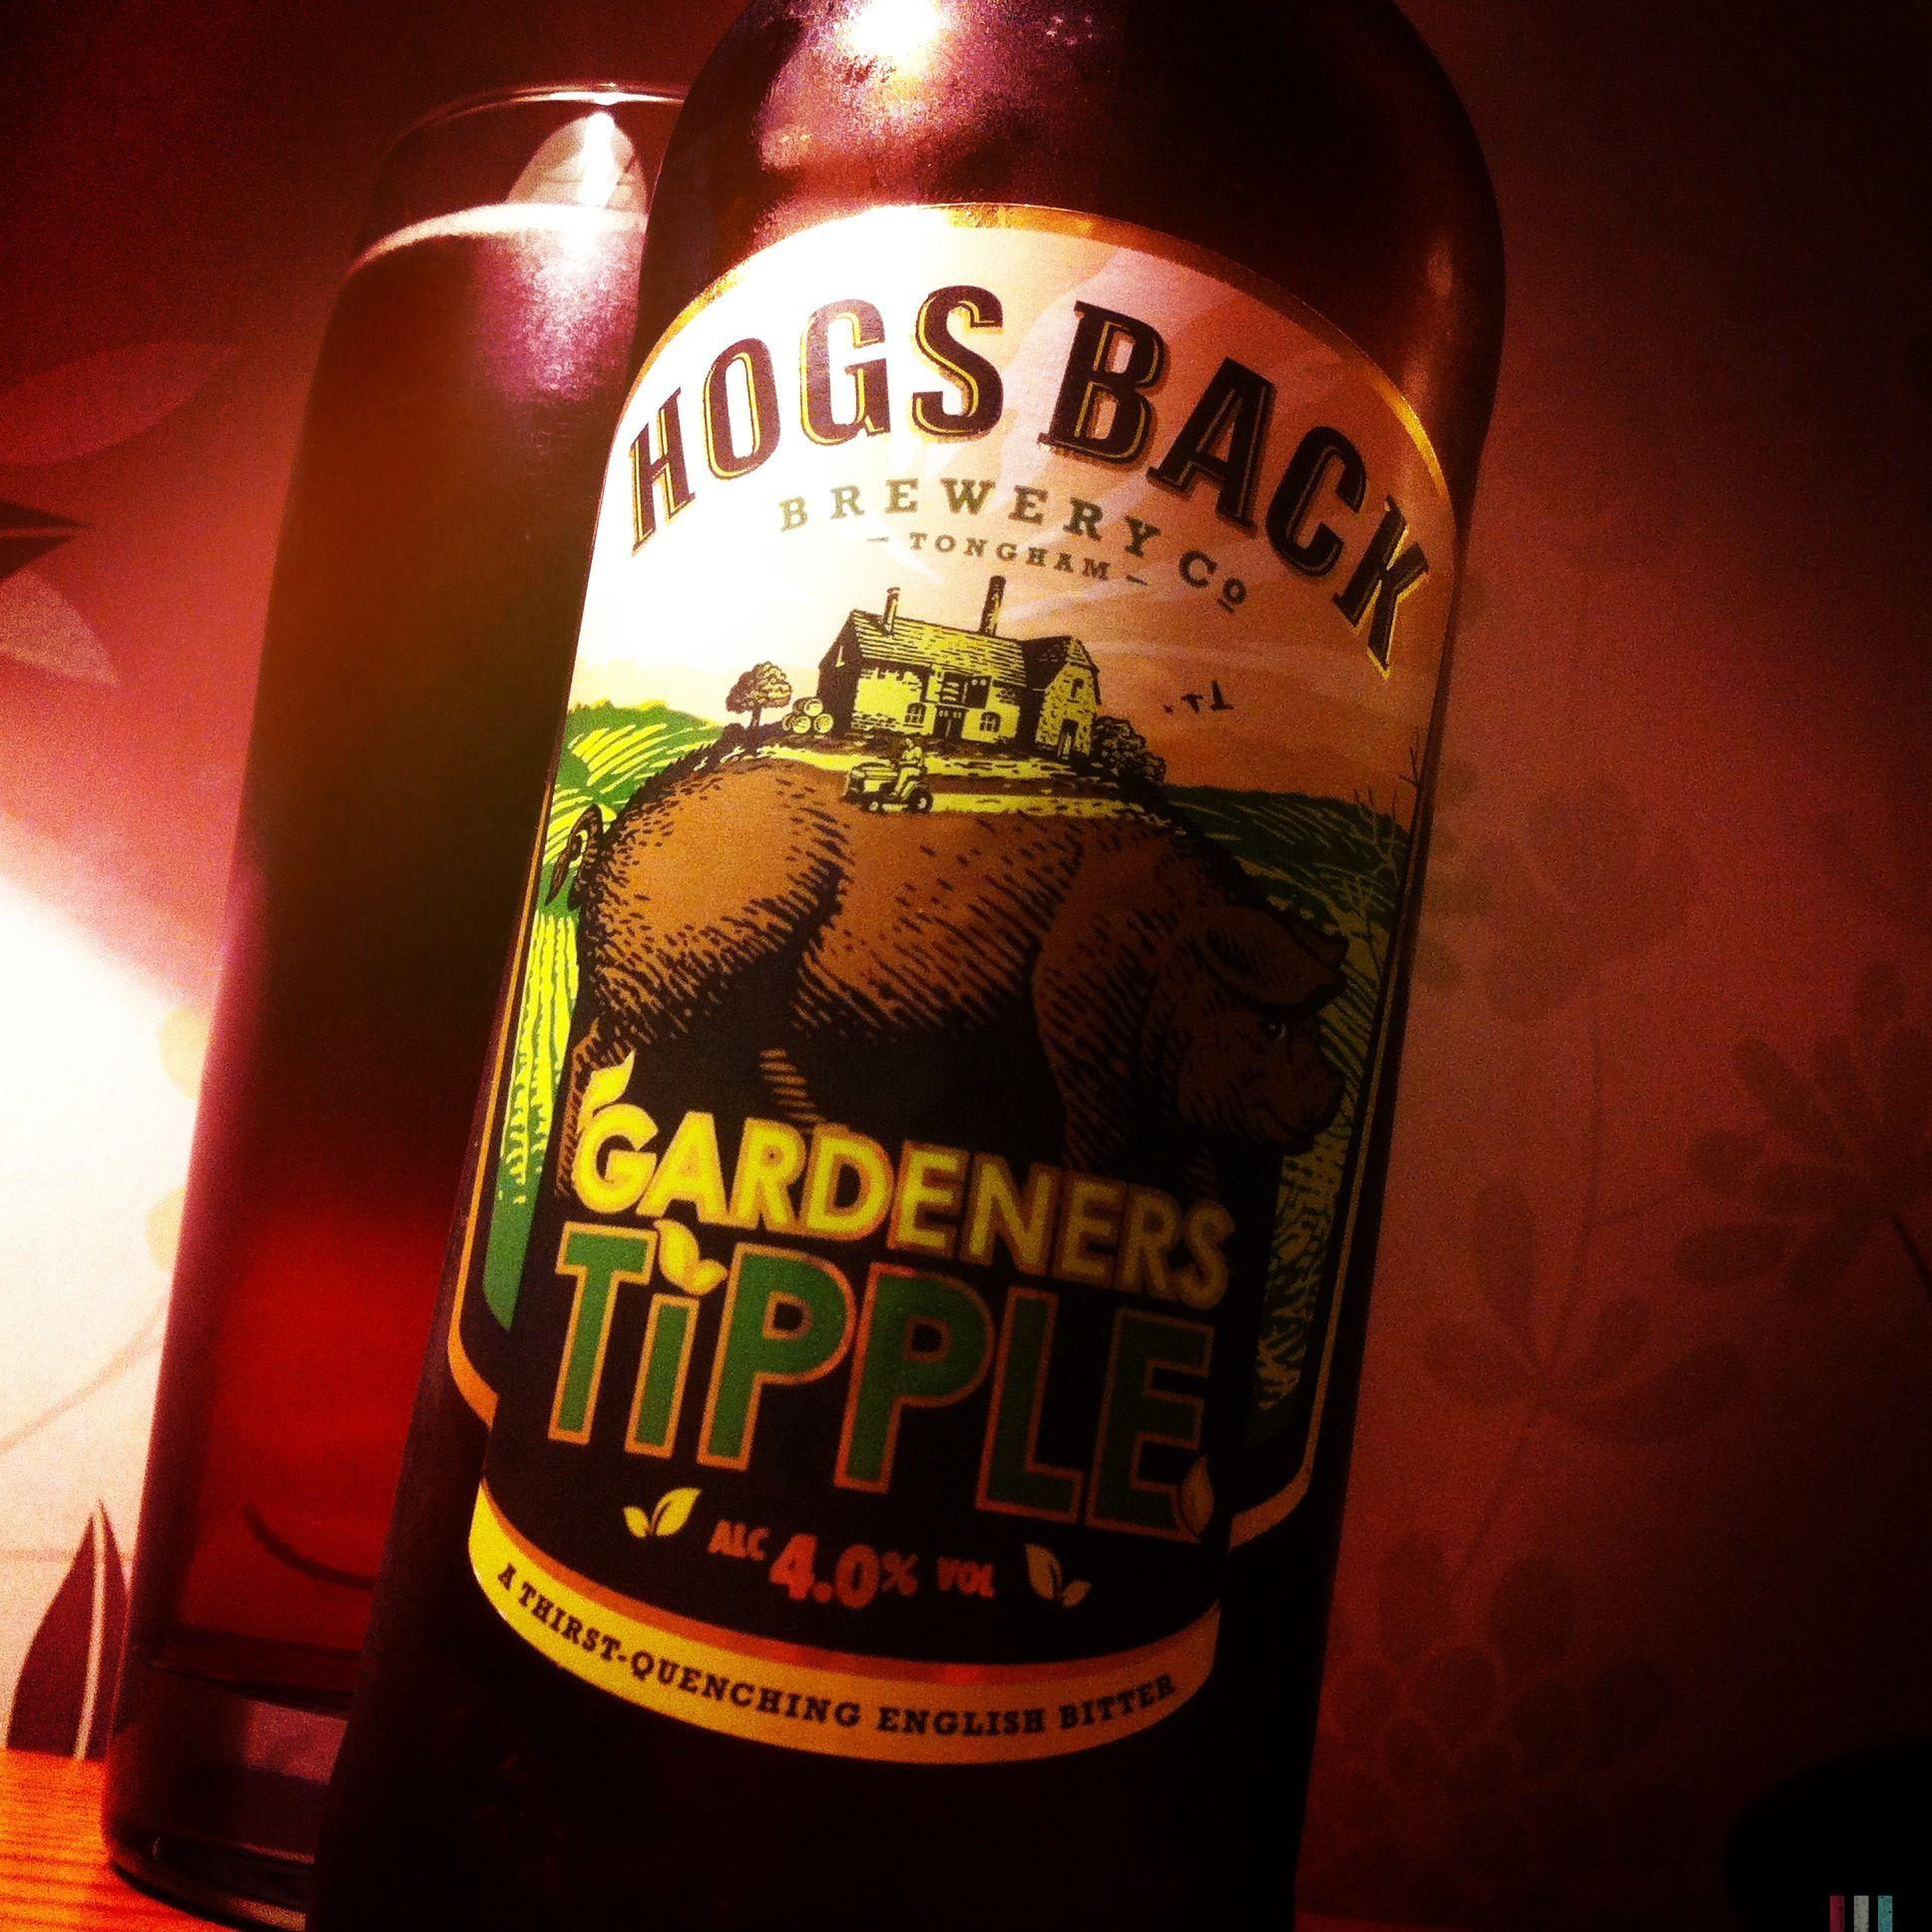 Gardeners tipple beer photography brewery corona beer